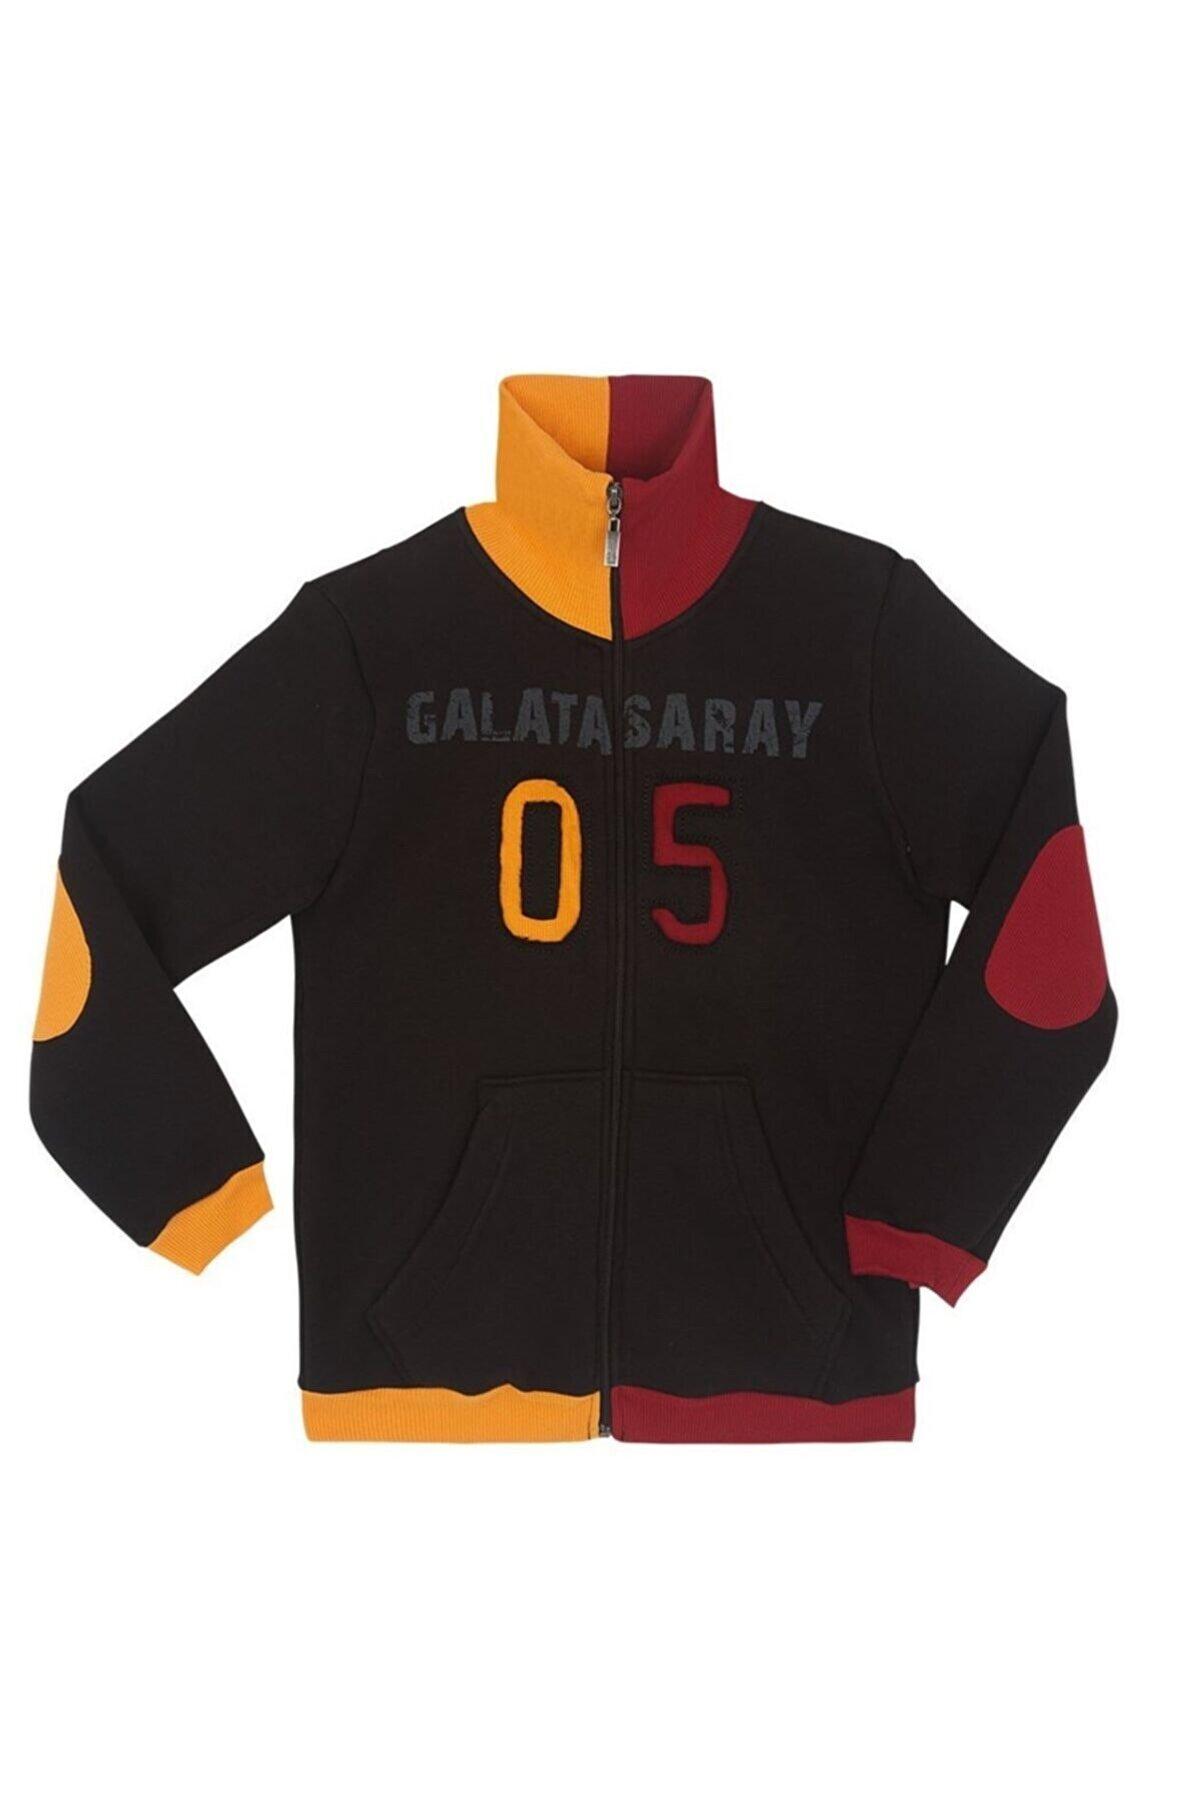 Galatasaray Galatasaray Forma-c13318 Ceket Syh